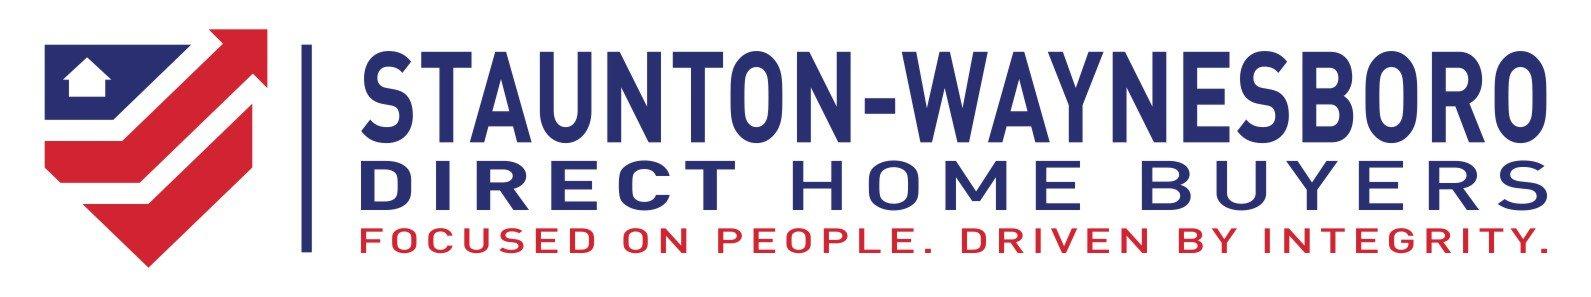 we buy houses Staunton VA   logo